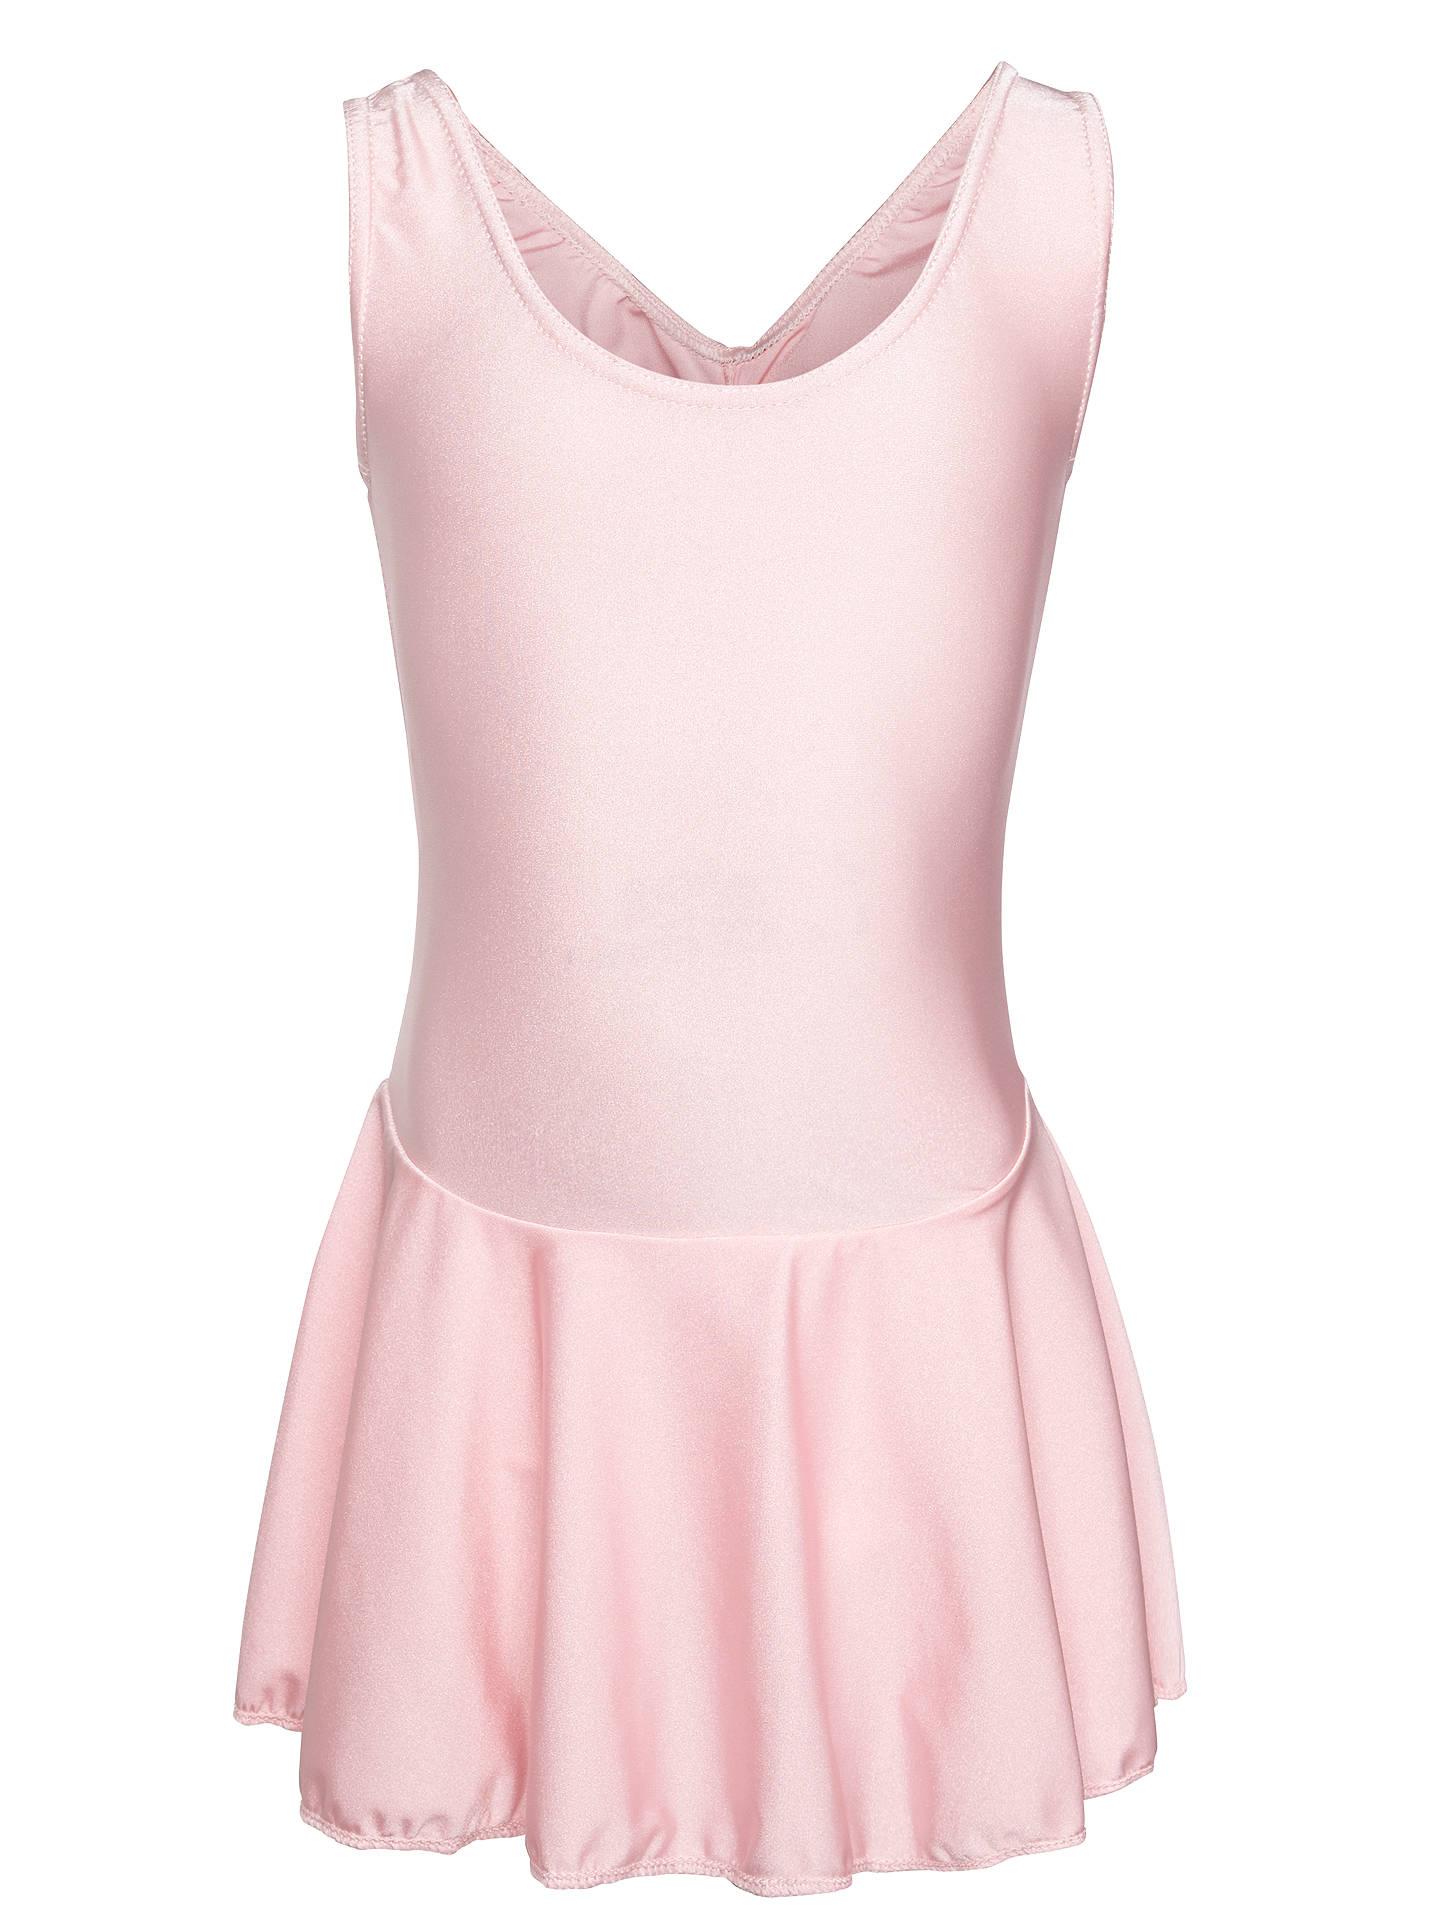 85bb5c66a1e901 ... Buy Freed Dancewear Jessy Skirt Leotard, Pink, 3-4 years Online at  johnlewis ...